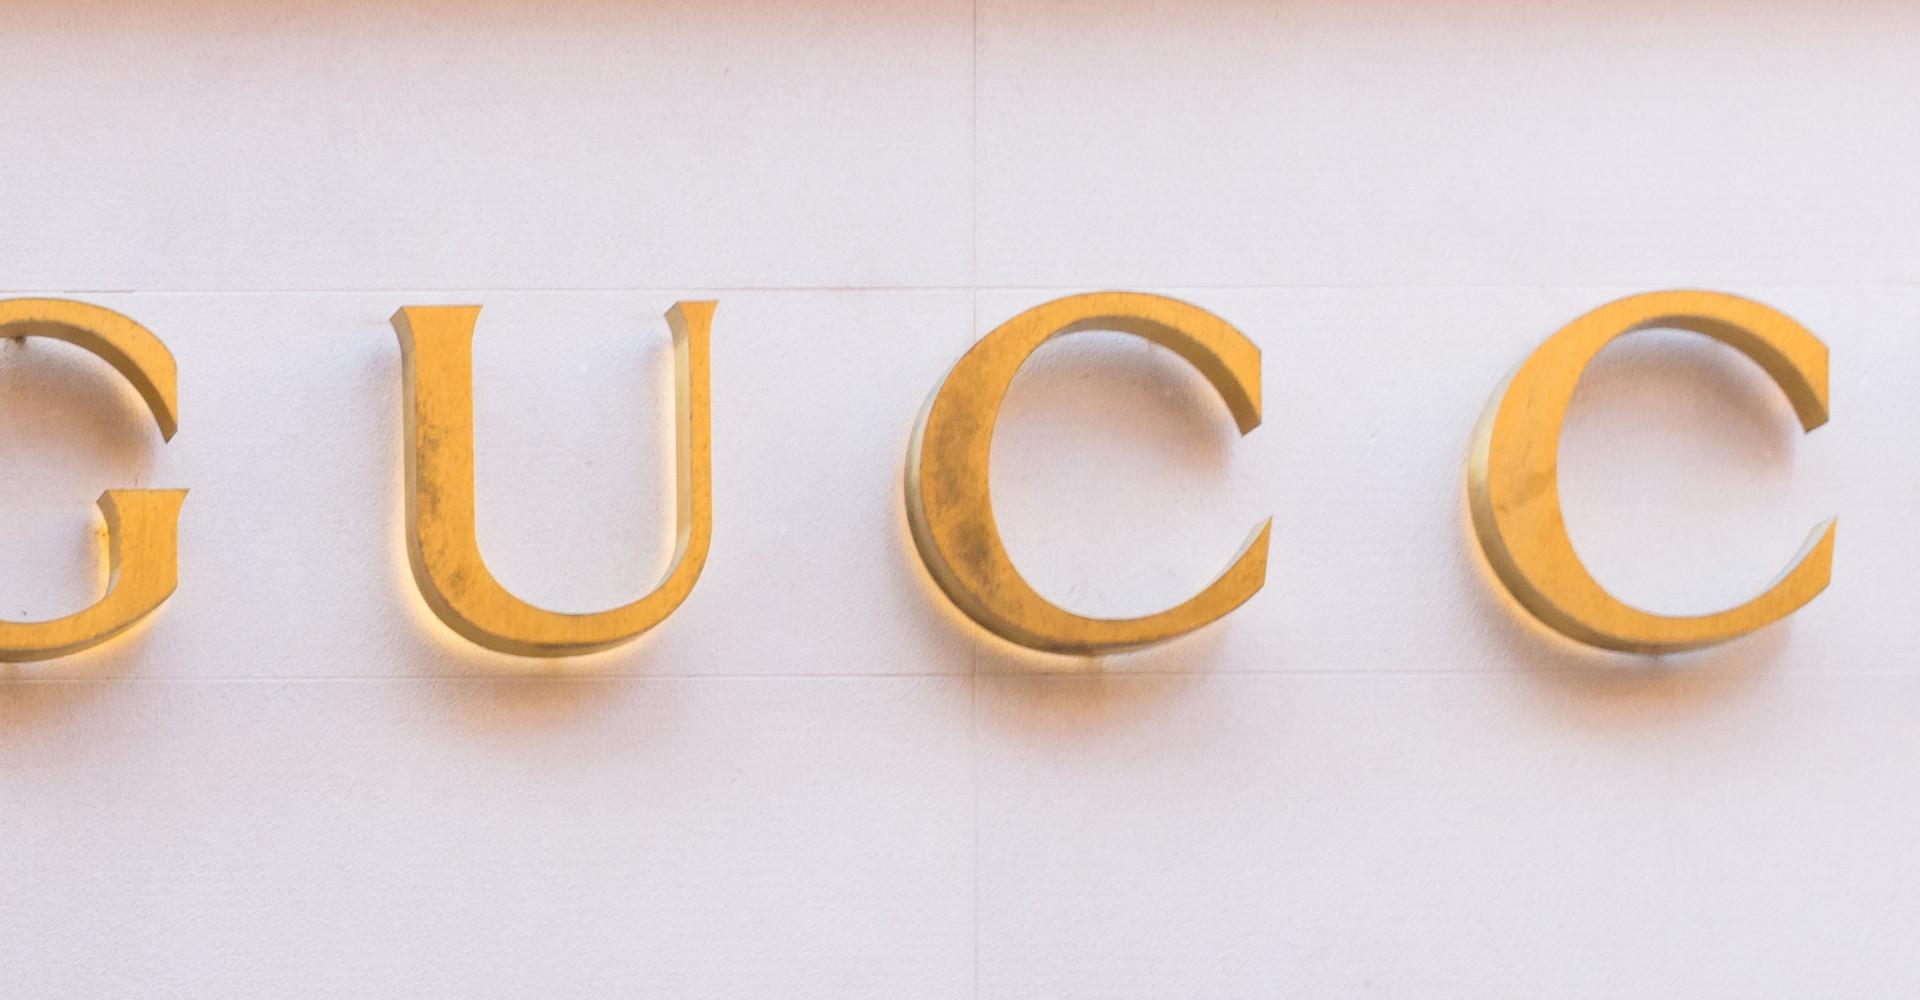 Gucci donates $500,000 towards gun control